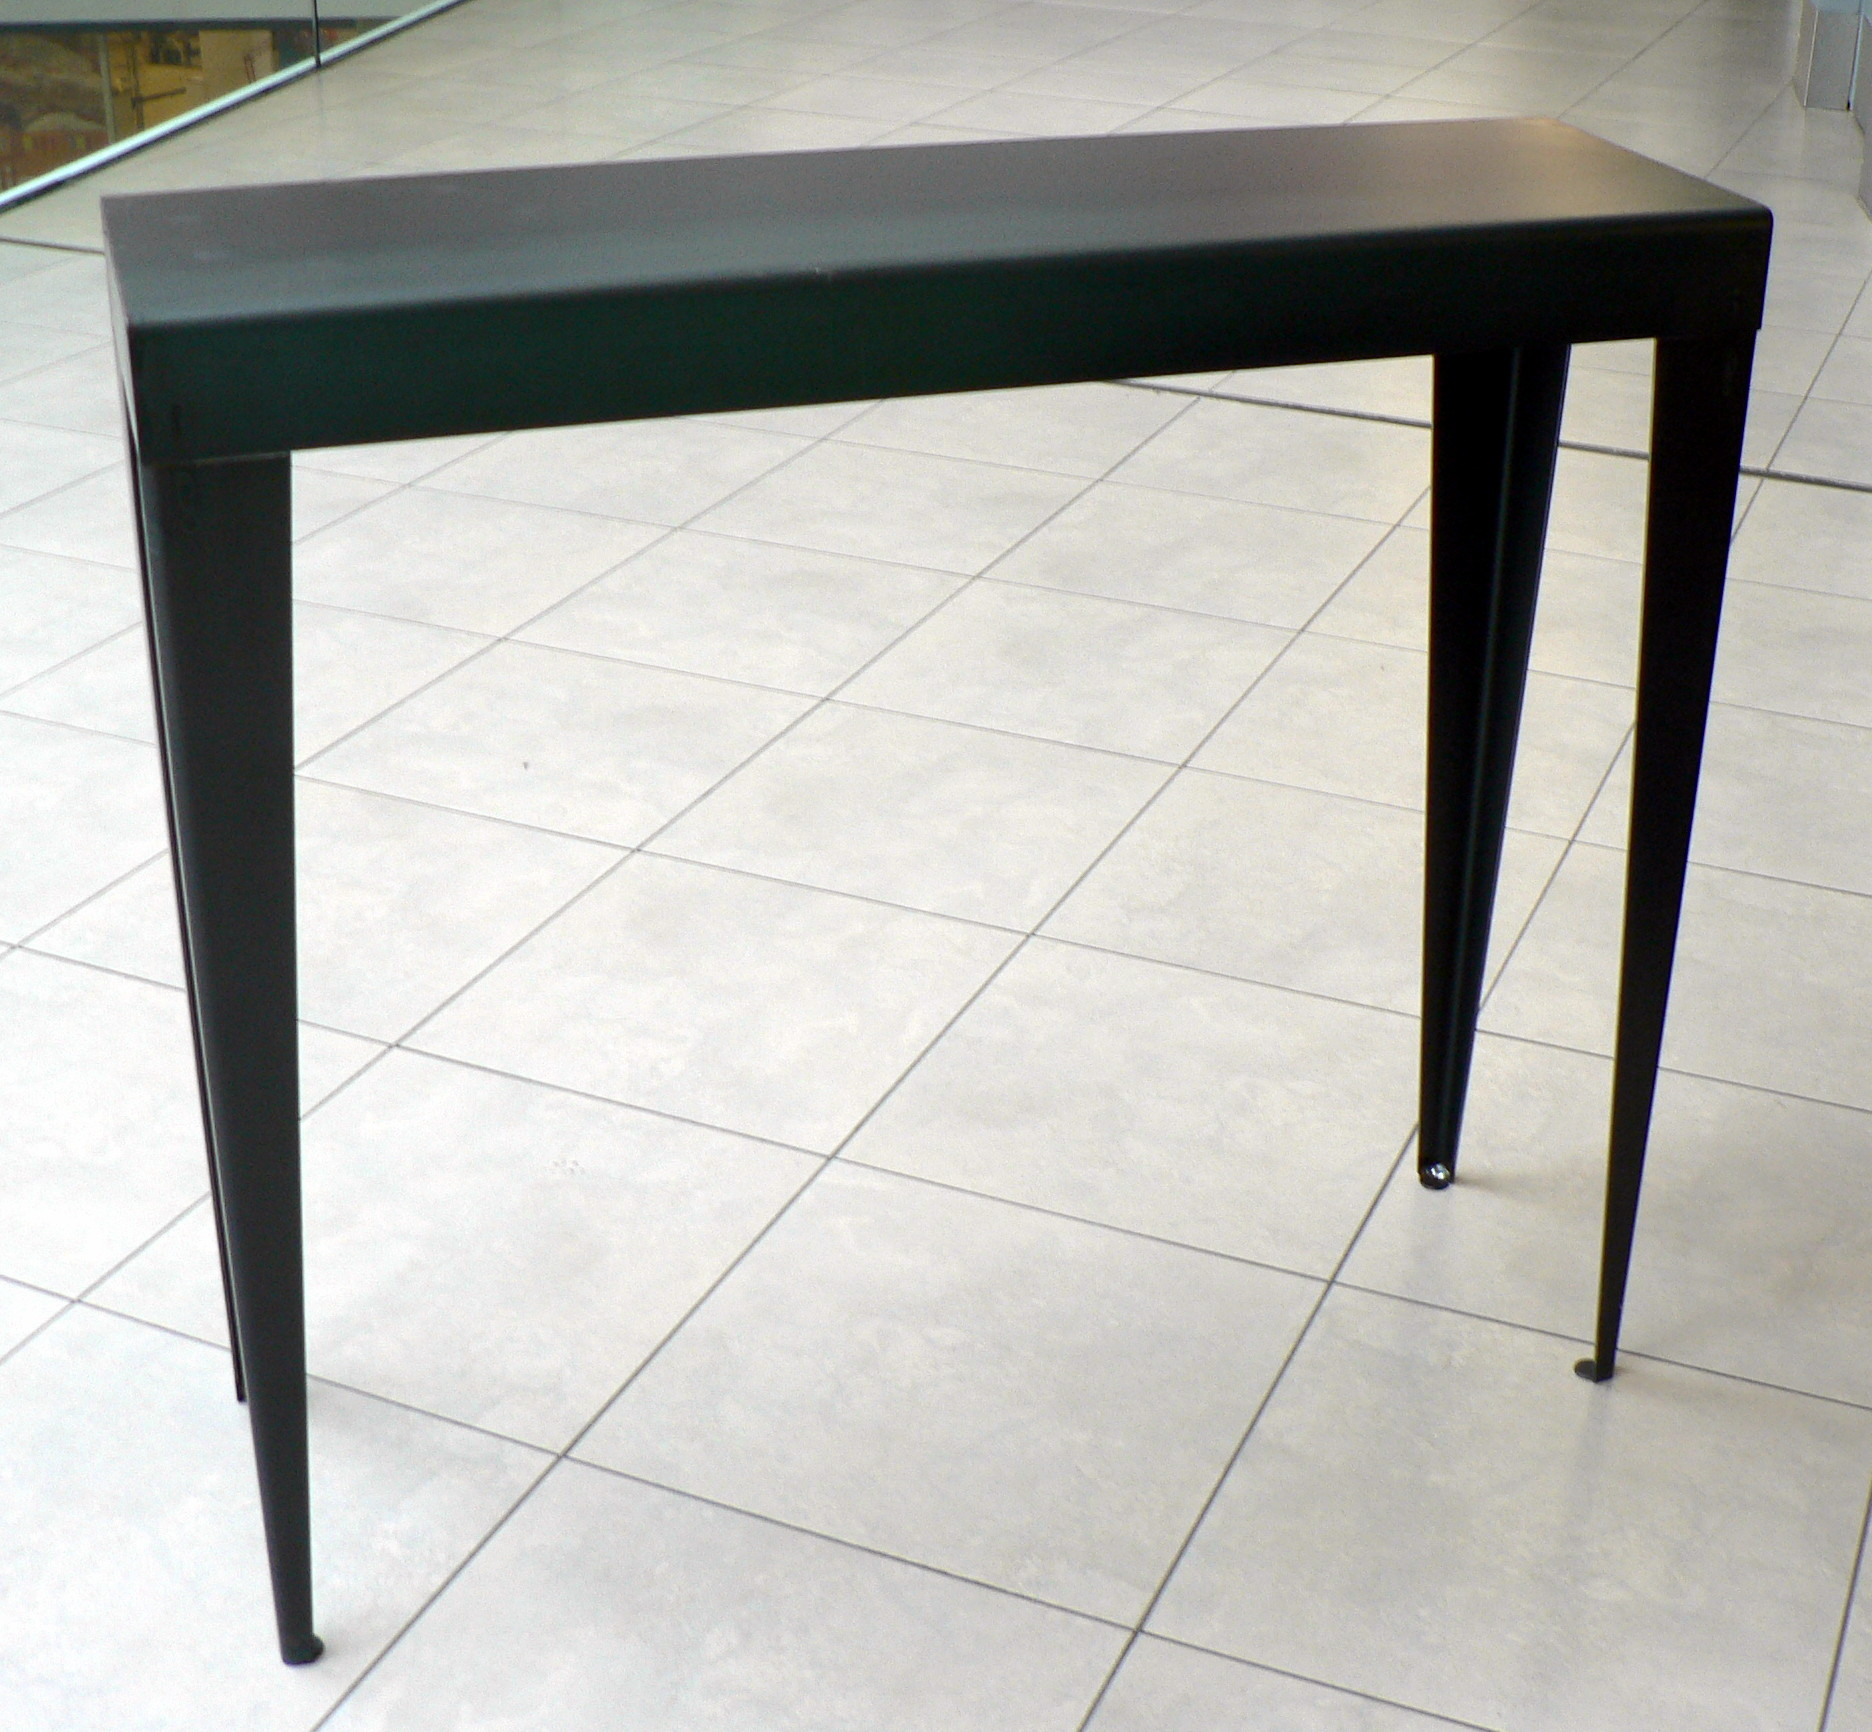 consoles en metal style loft sur mesures. Black Bedroom Furniture Sets. Home Design Ideas